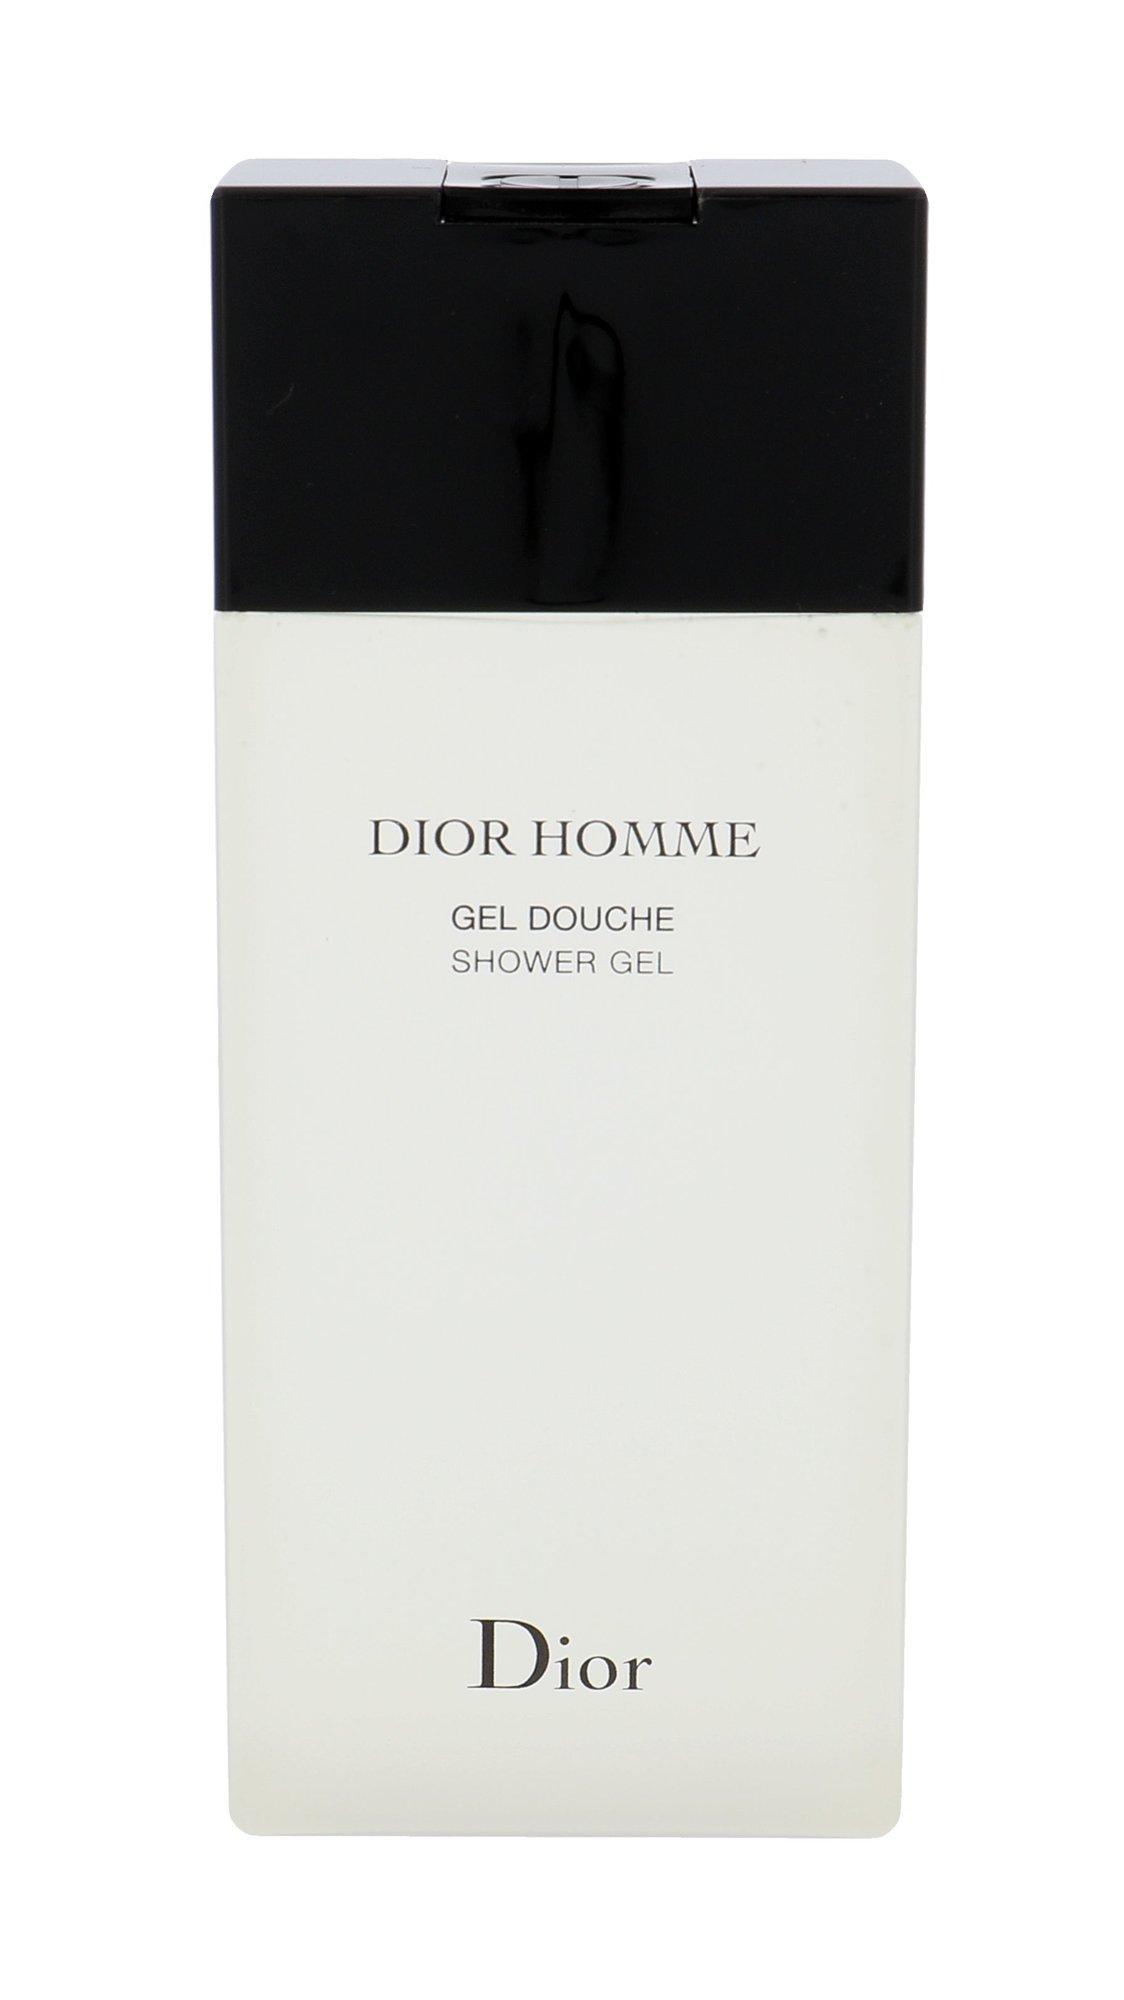 Christian Dior Dior Homme Shower gel 200ml